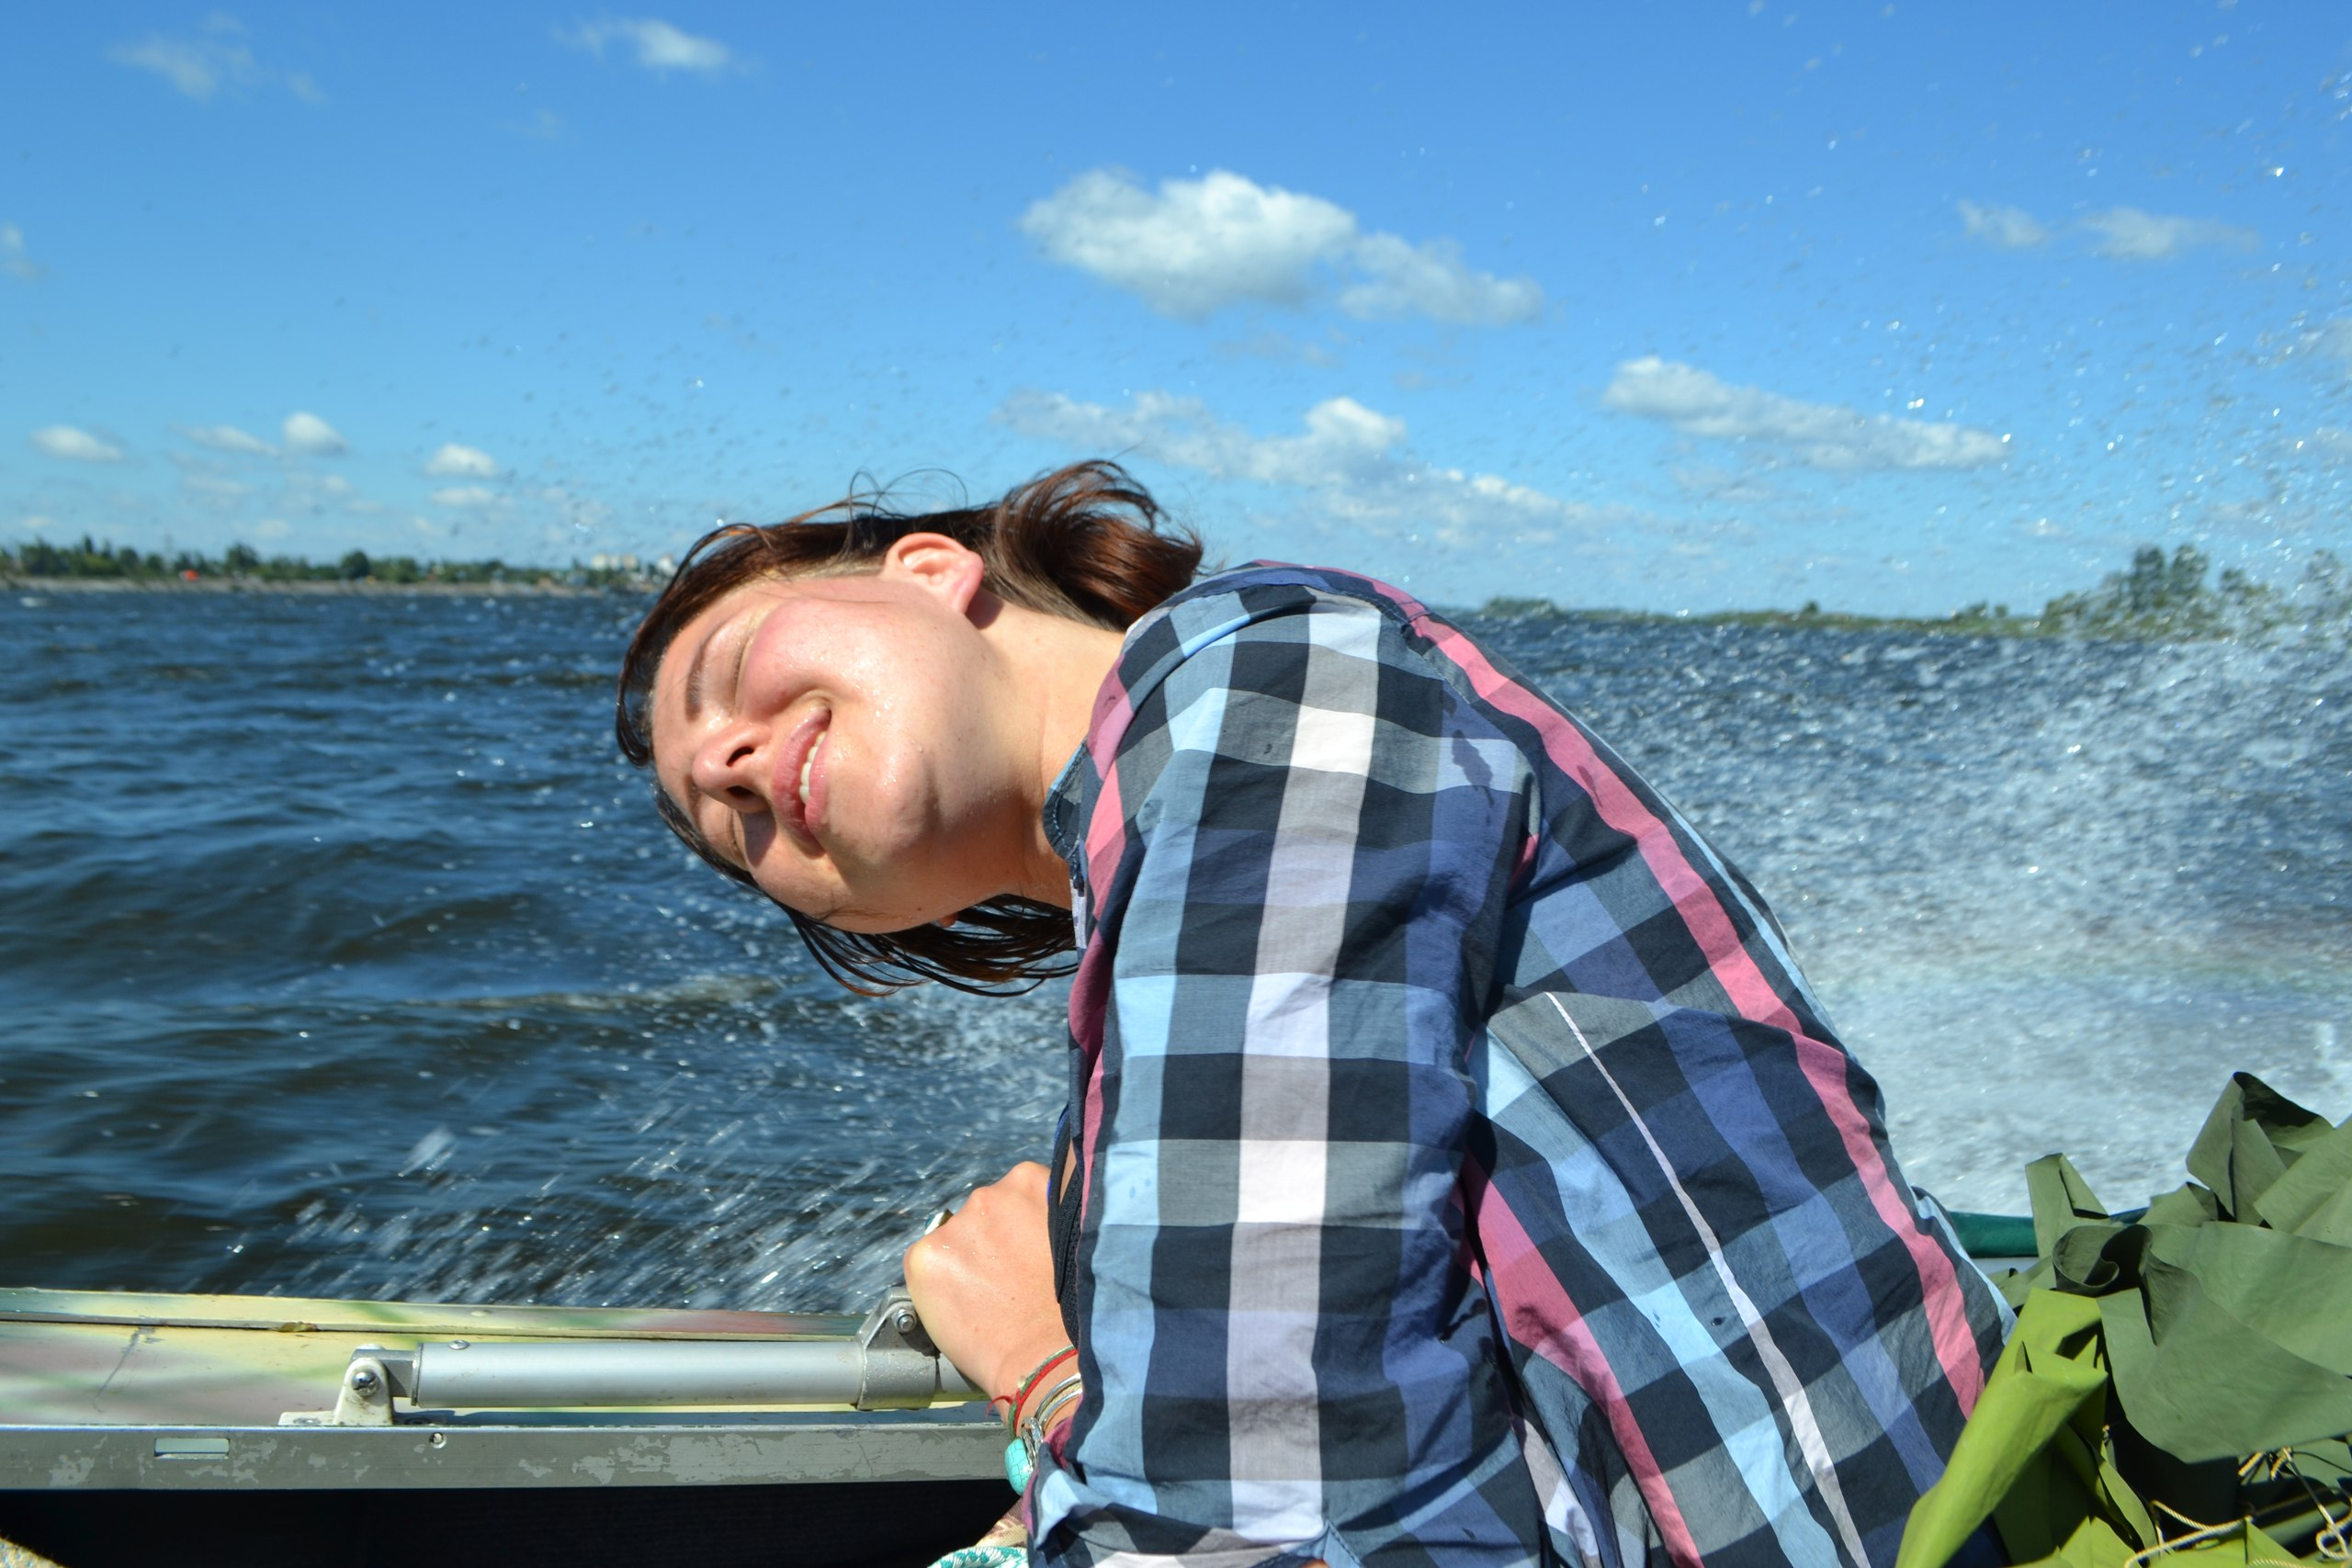 Елена Руденко Охота на водоплавающую дичь ( Украинка. 24-25 августа. 2016 г.) - Страница 2 Om1sGsWGLCs